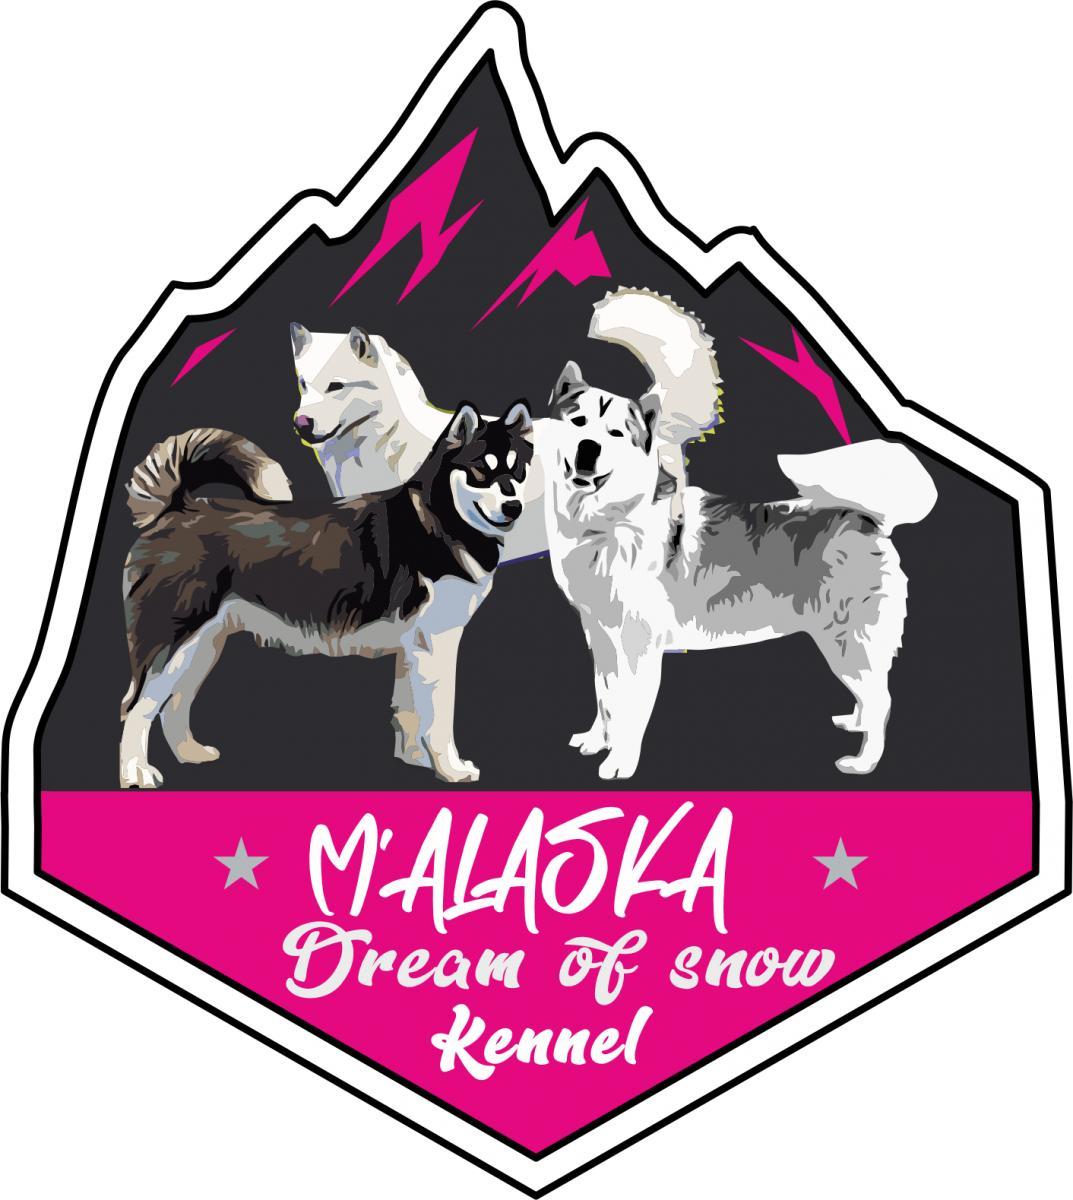 M'alaska Dream Of Snow